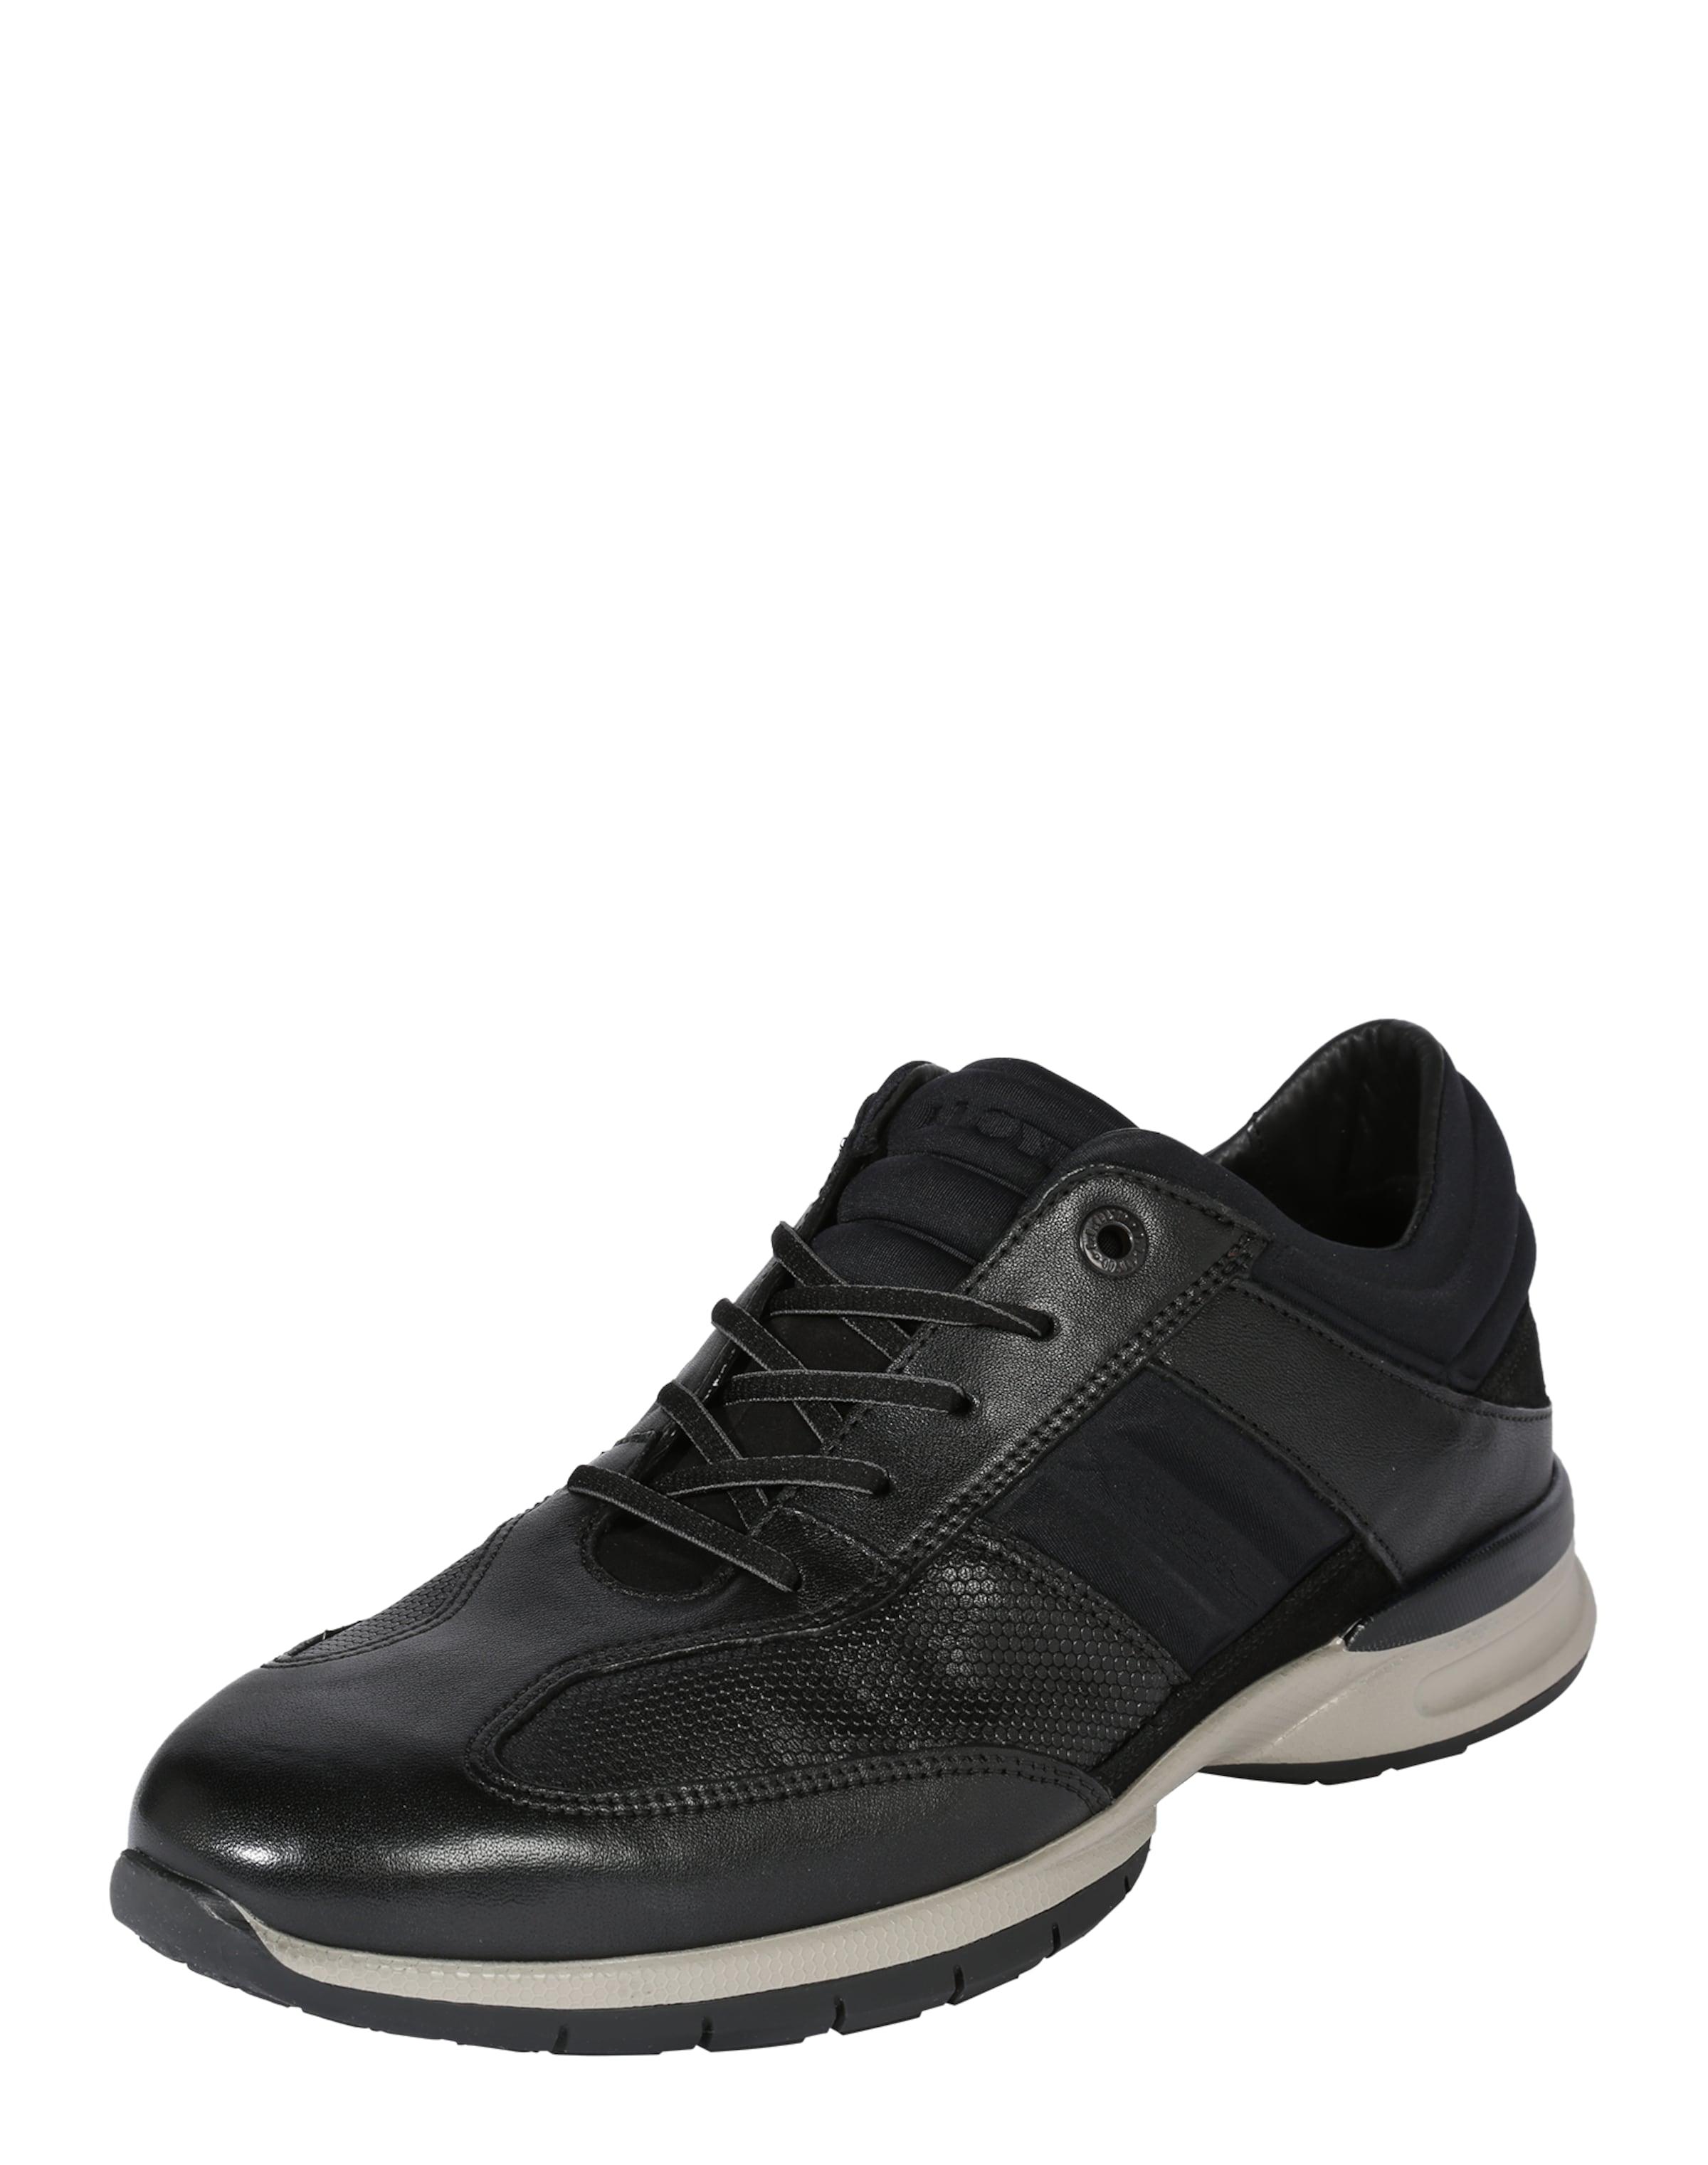 LLOYD Sneaker Ascot Verschleißfeste billige Schuhe